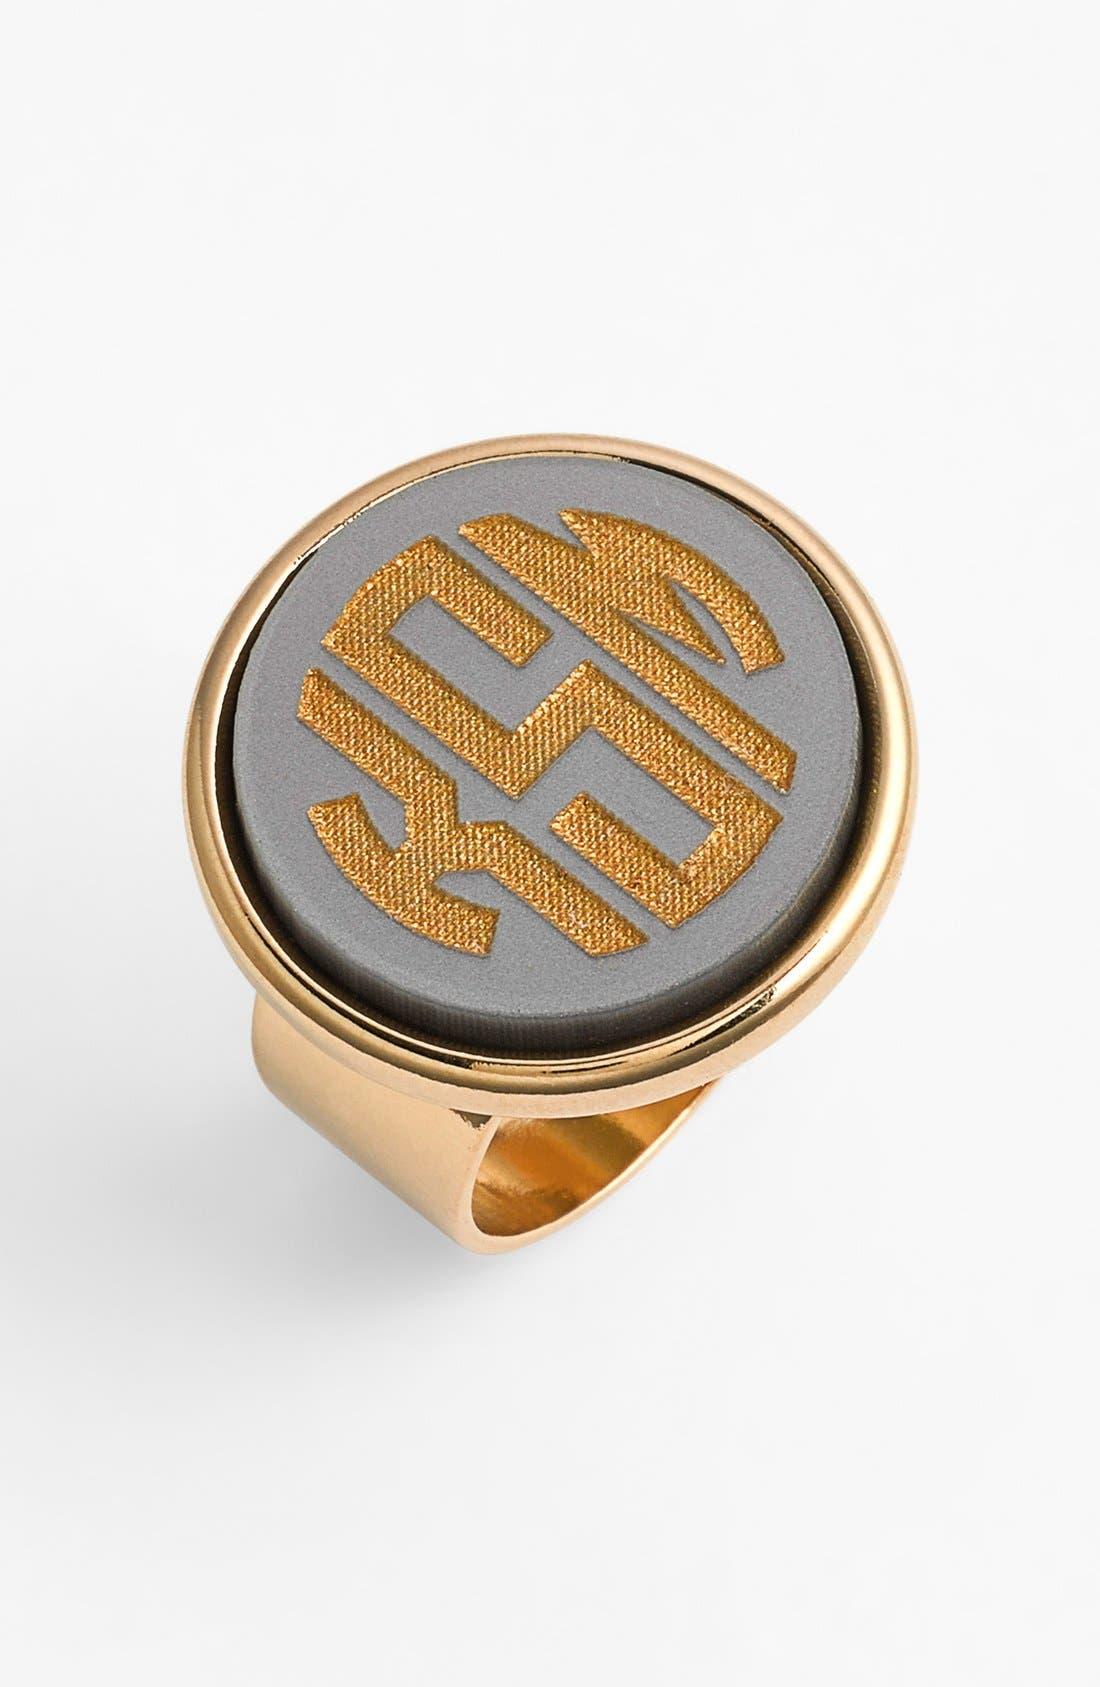 Main Image - Moon and Lola 'Vineyard' Personalized Monogram Ring